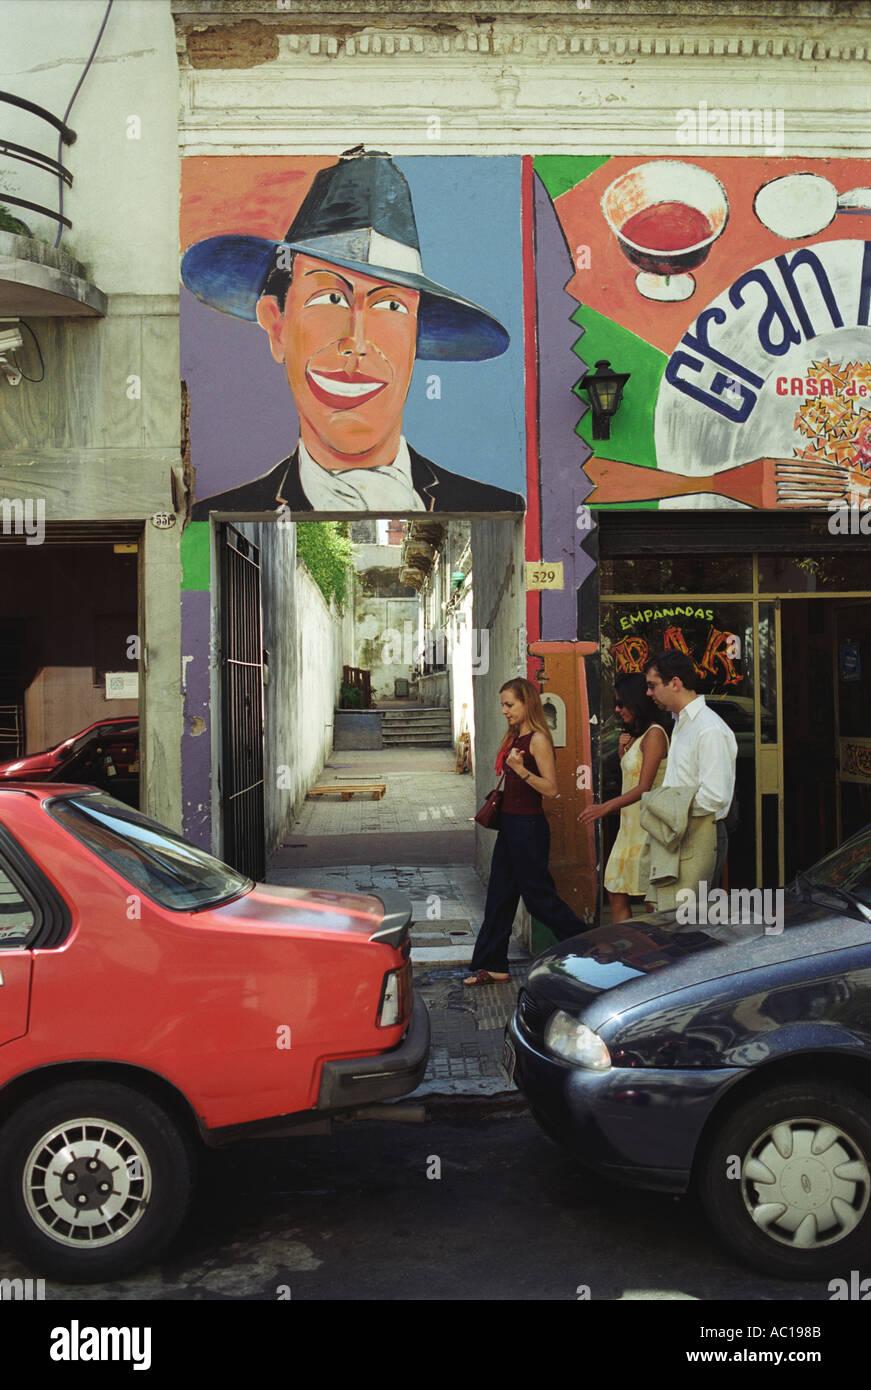 Ttango Wandbild von Carlos Gardel San Telmo Bezirk, Buenos Aires-Argentinien-Südamerika.   Wandmalerei HOMER Stockbild